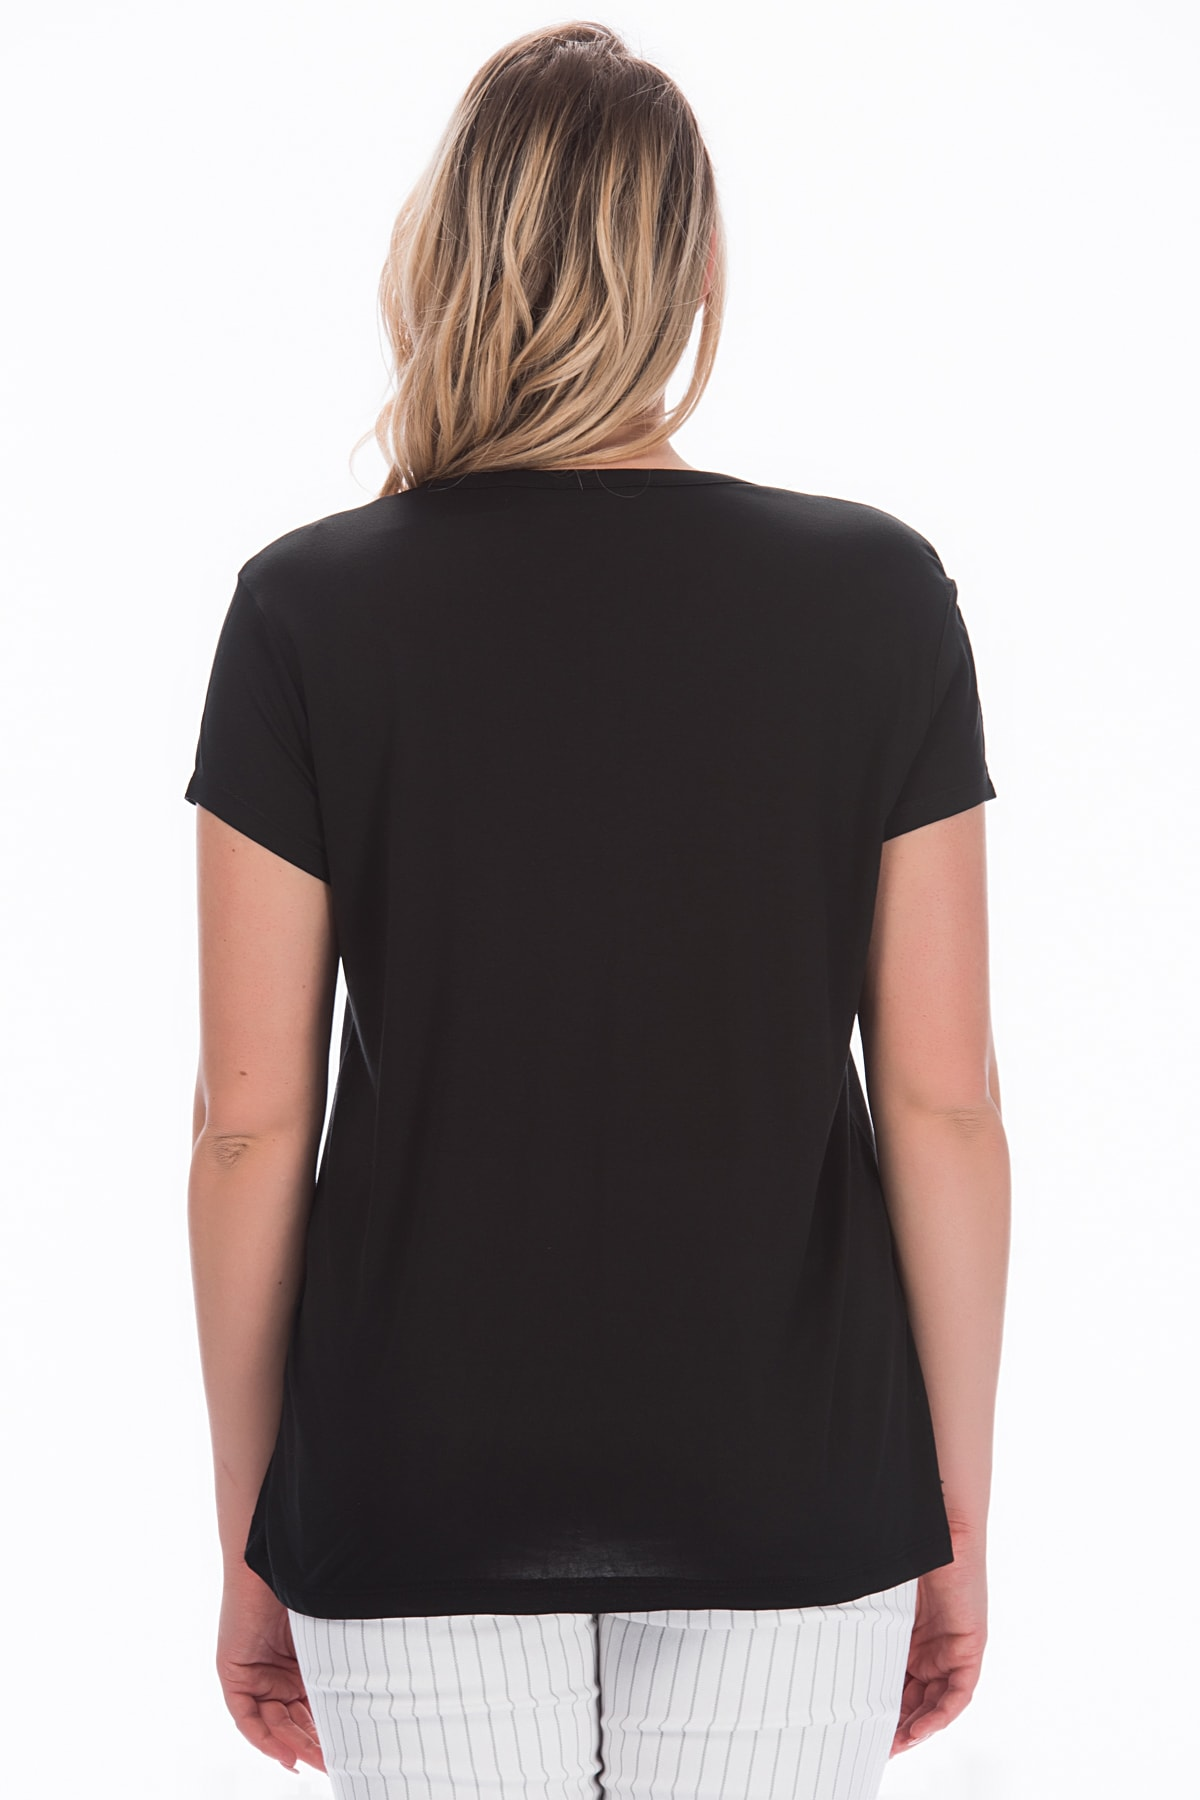 Şans Kadın Siyah V Yakalı Viskon Bluz 65N22538 2